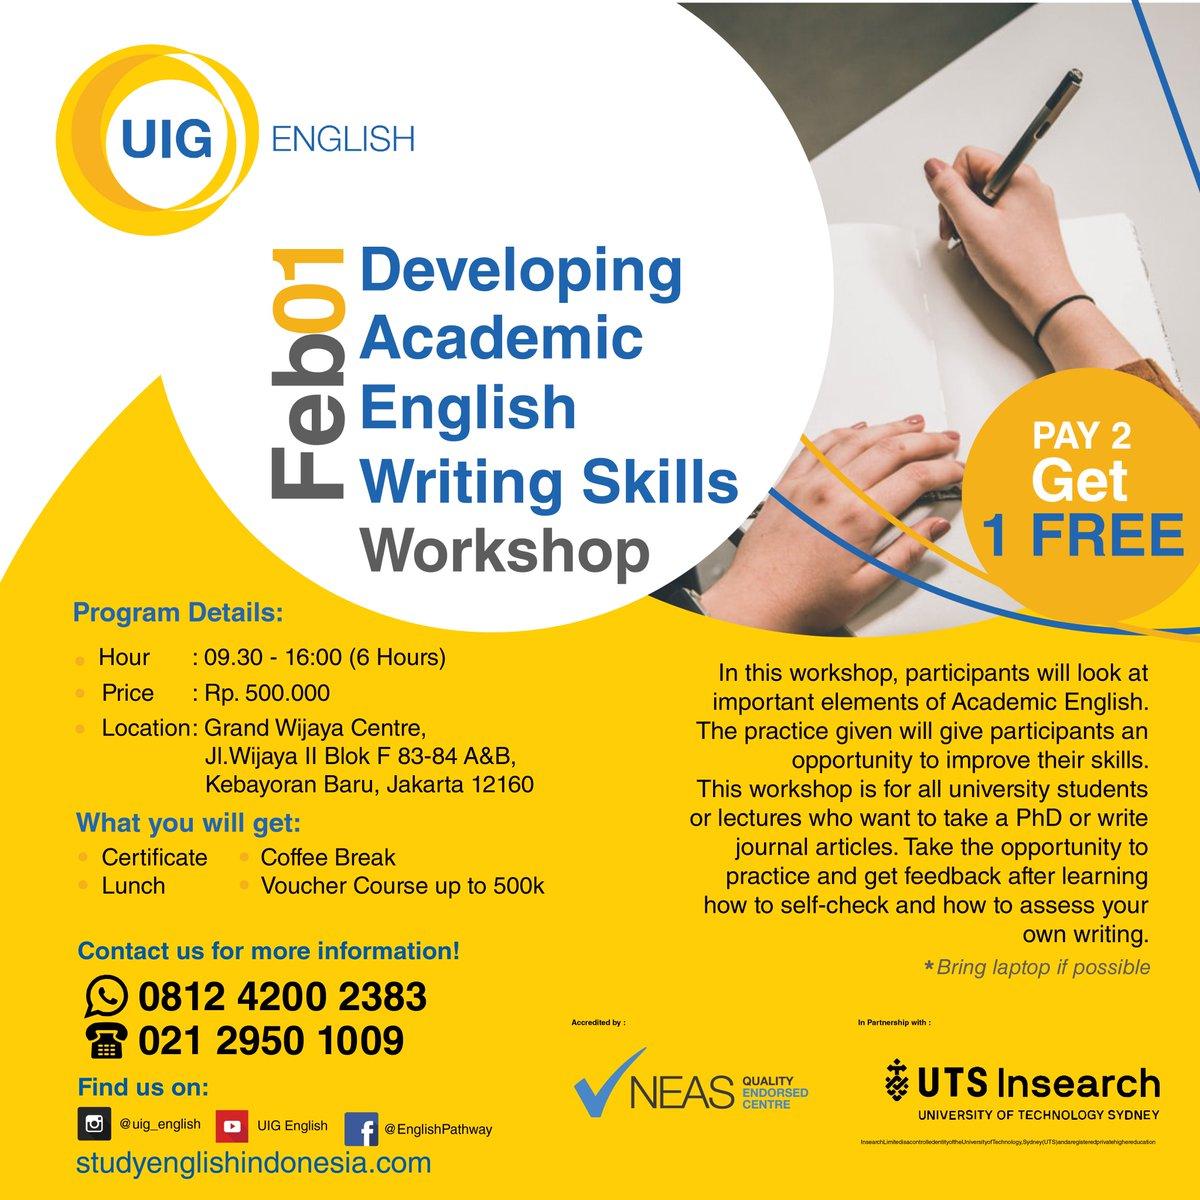 Developing Academic English Writing Skills  LIMITED SEATS!! For more information (+62) 813 4200 2383 (wa) (+62) 21 2950 1009 (office)  Or click the link on our bio!  #UIGEnglish #workshop #creativeminds #creative #becreative #kreatif #inovasi #jakarta #trending #trendingjakarta